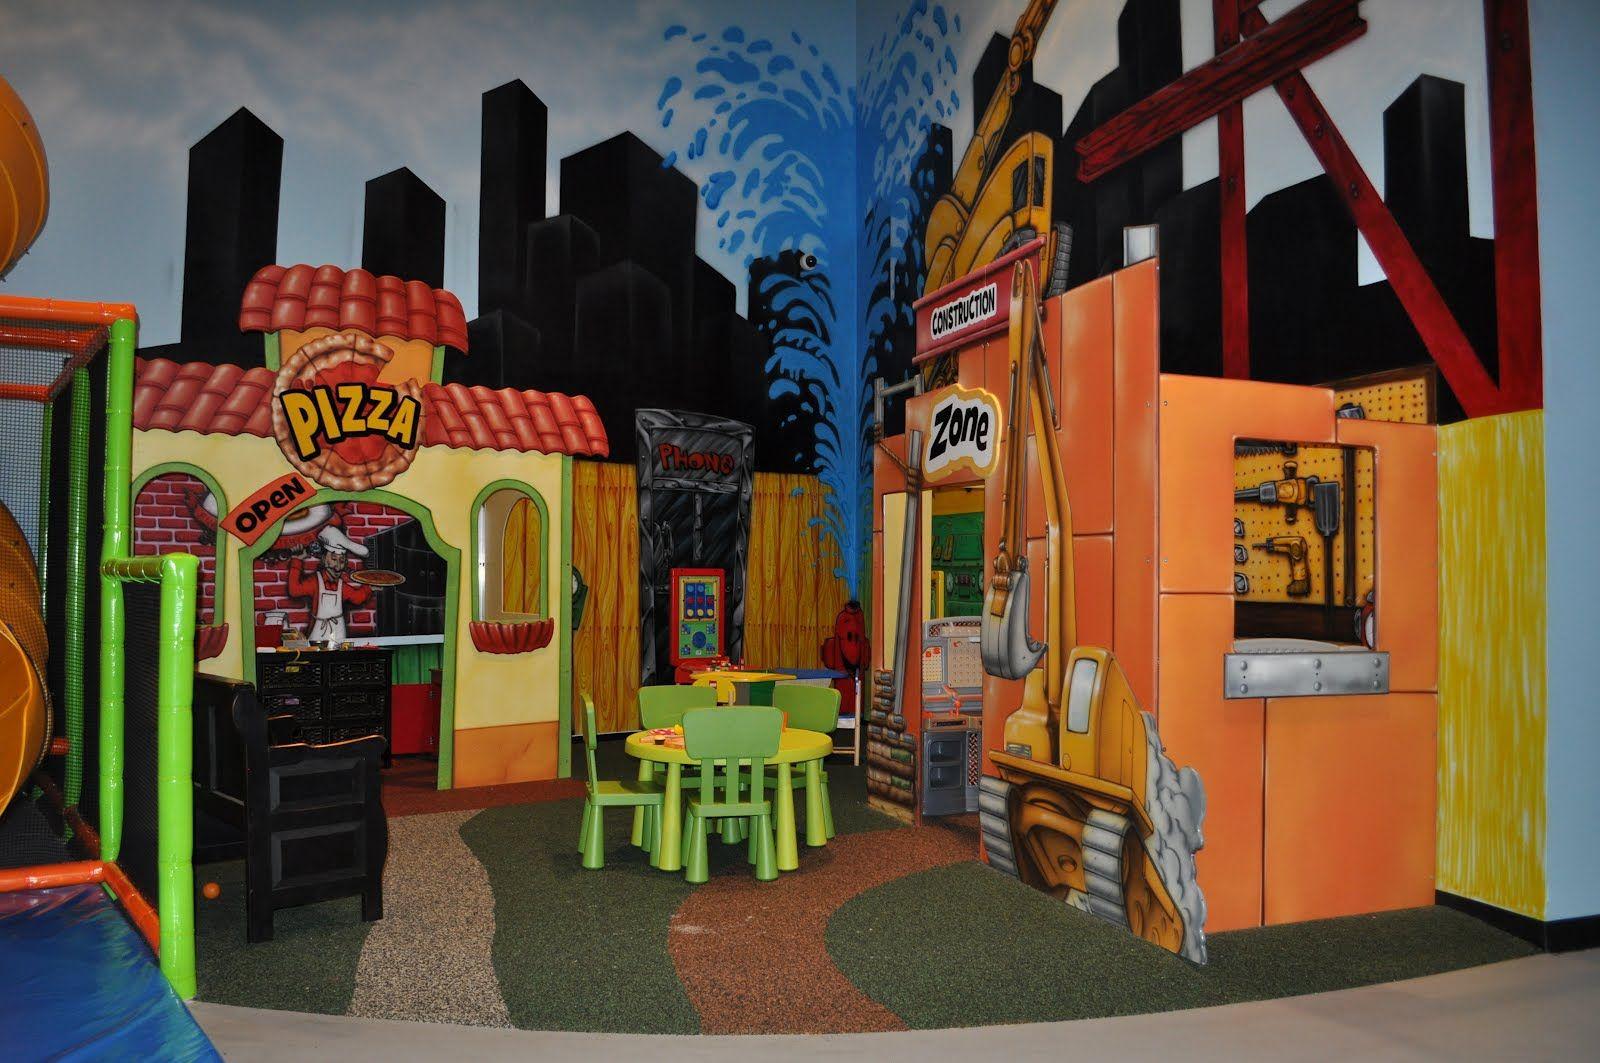 Covenant Church Indoor Playground Worlds Of Wow Blog Tiny - Church nursery wall decalsbest church nurserychildrens church decor images on